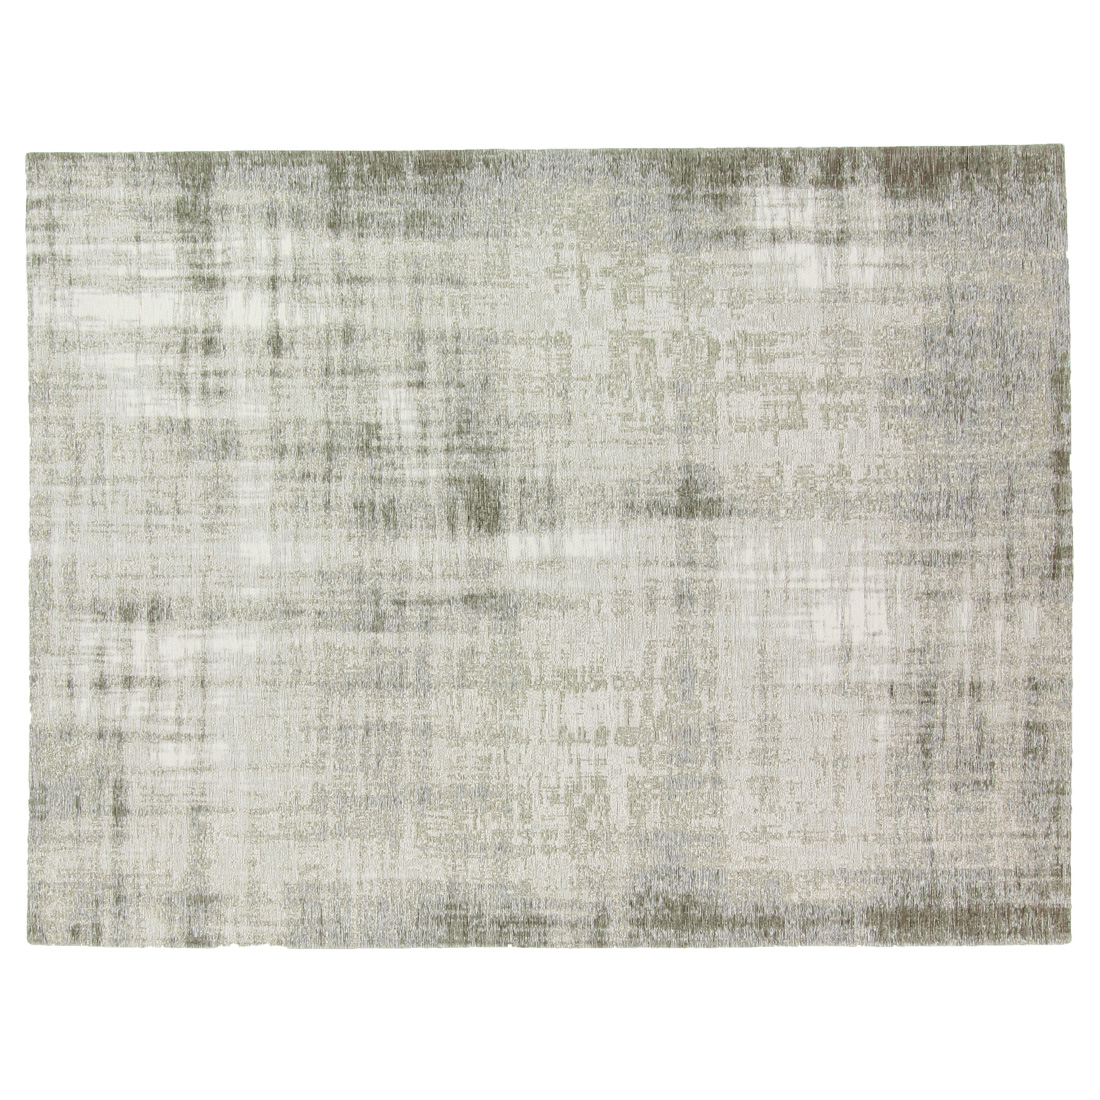 Vloerkleed Brinker Grunge Silver | 240 x 340 cm